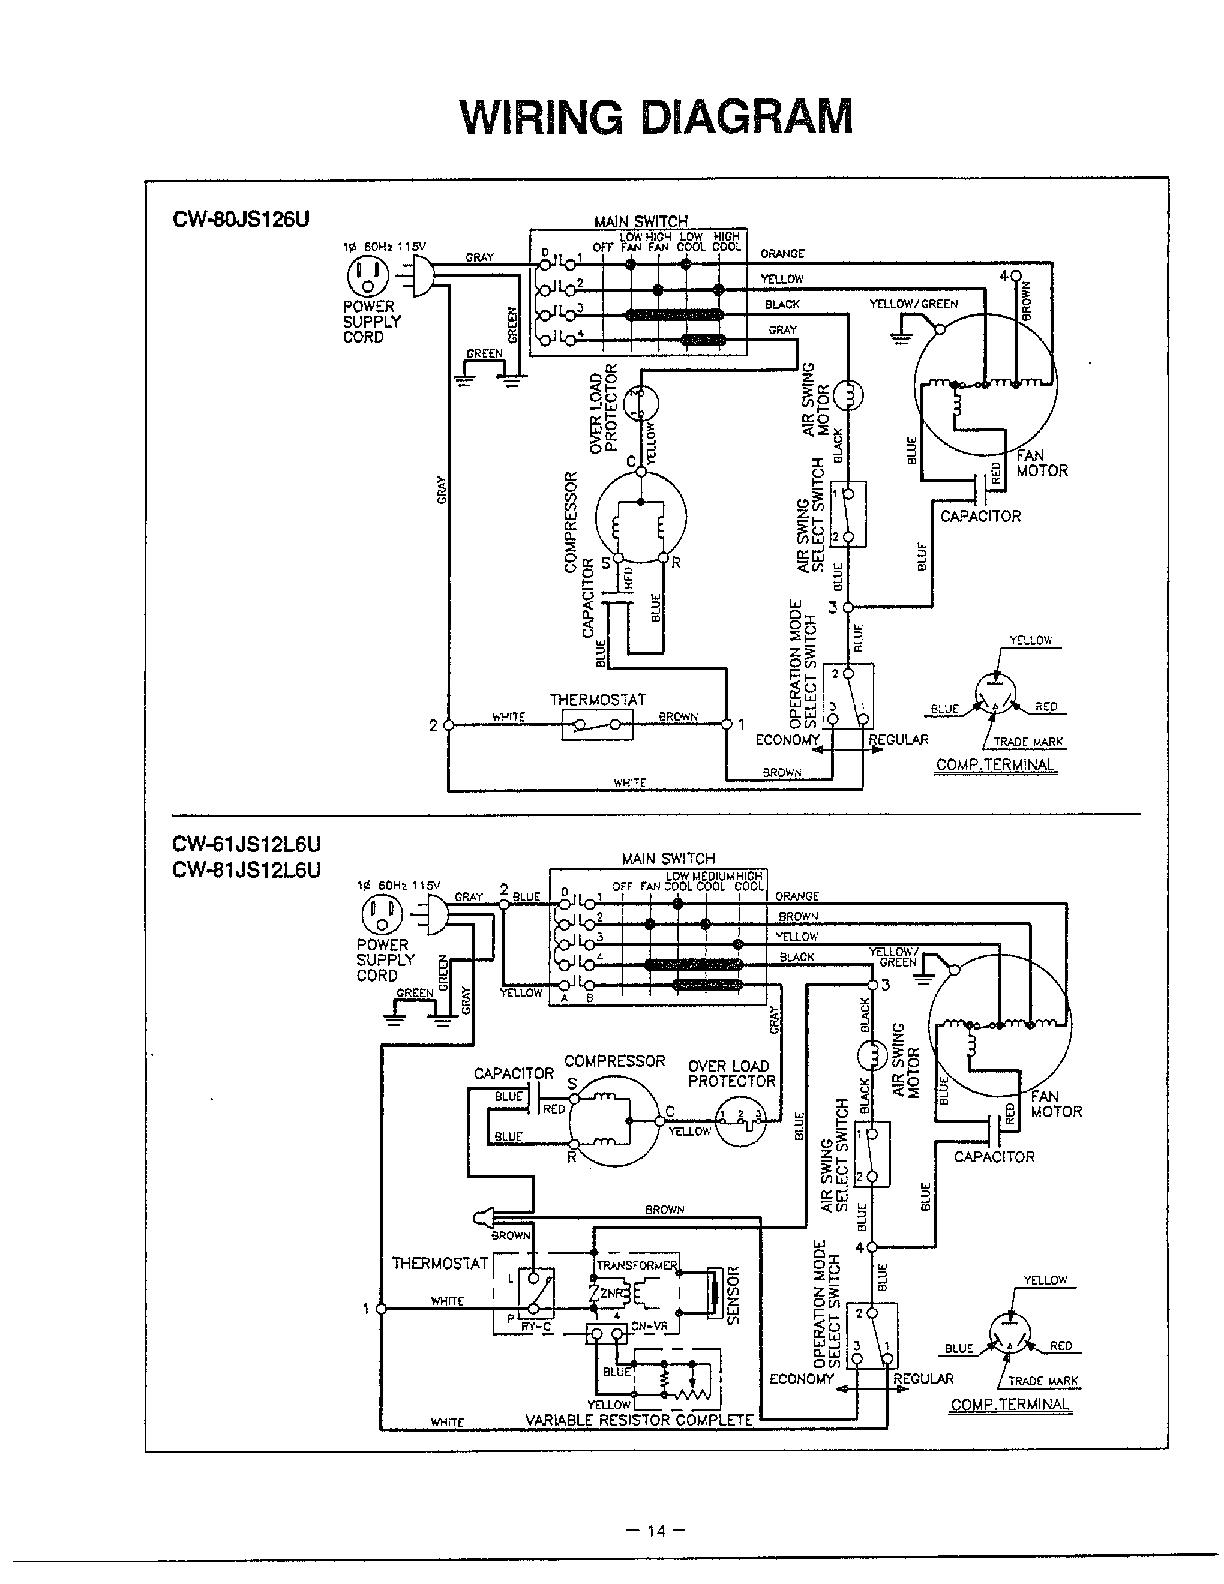 Rv Air Conditioner Wiring Diagram